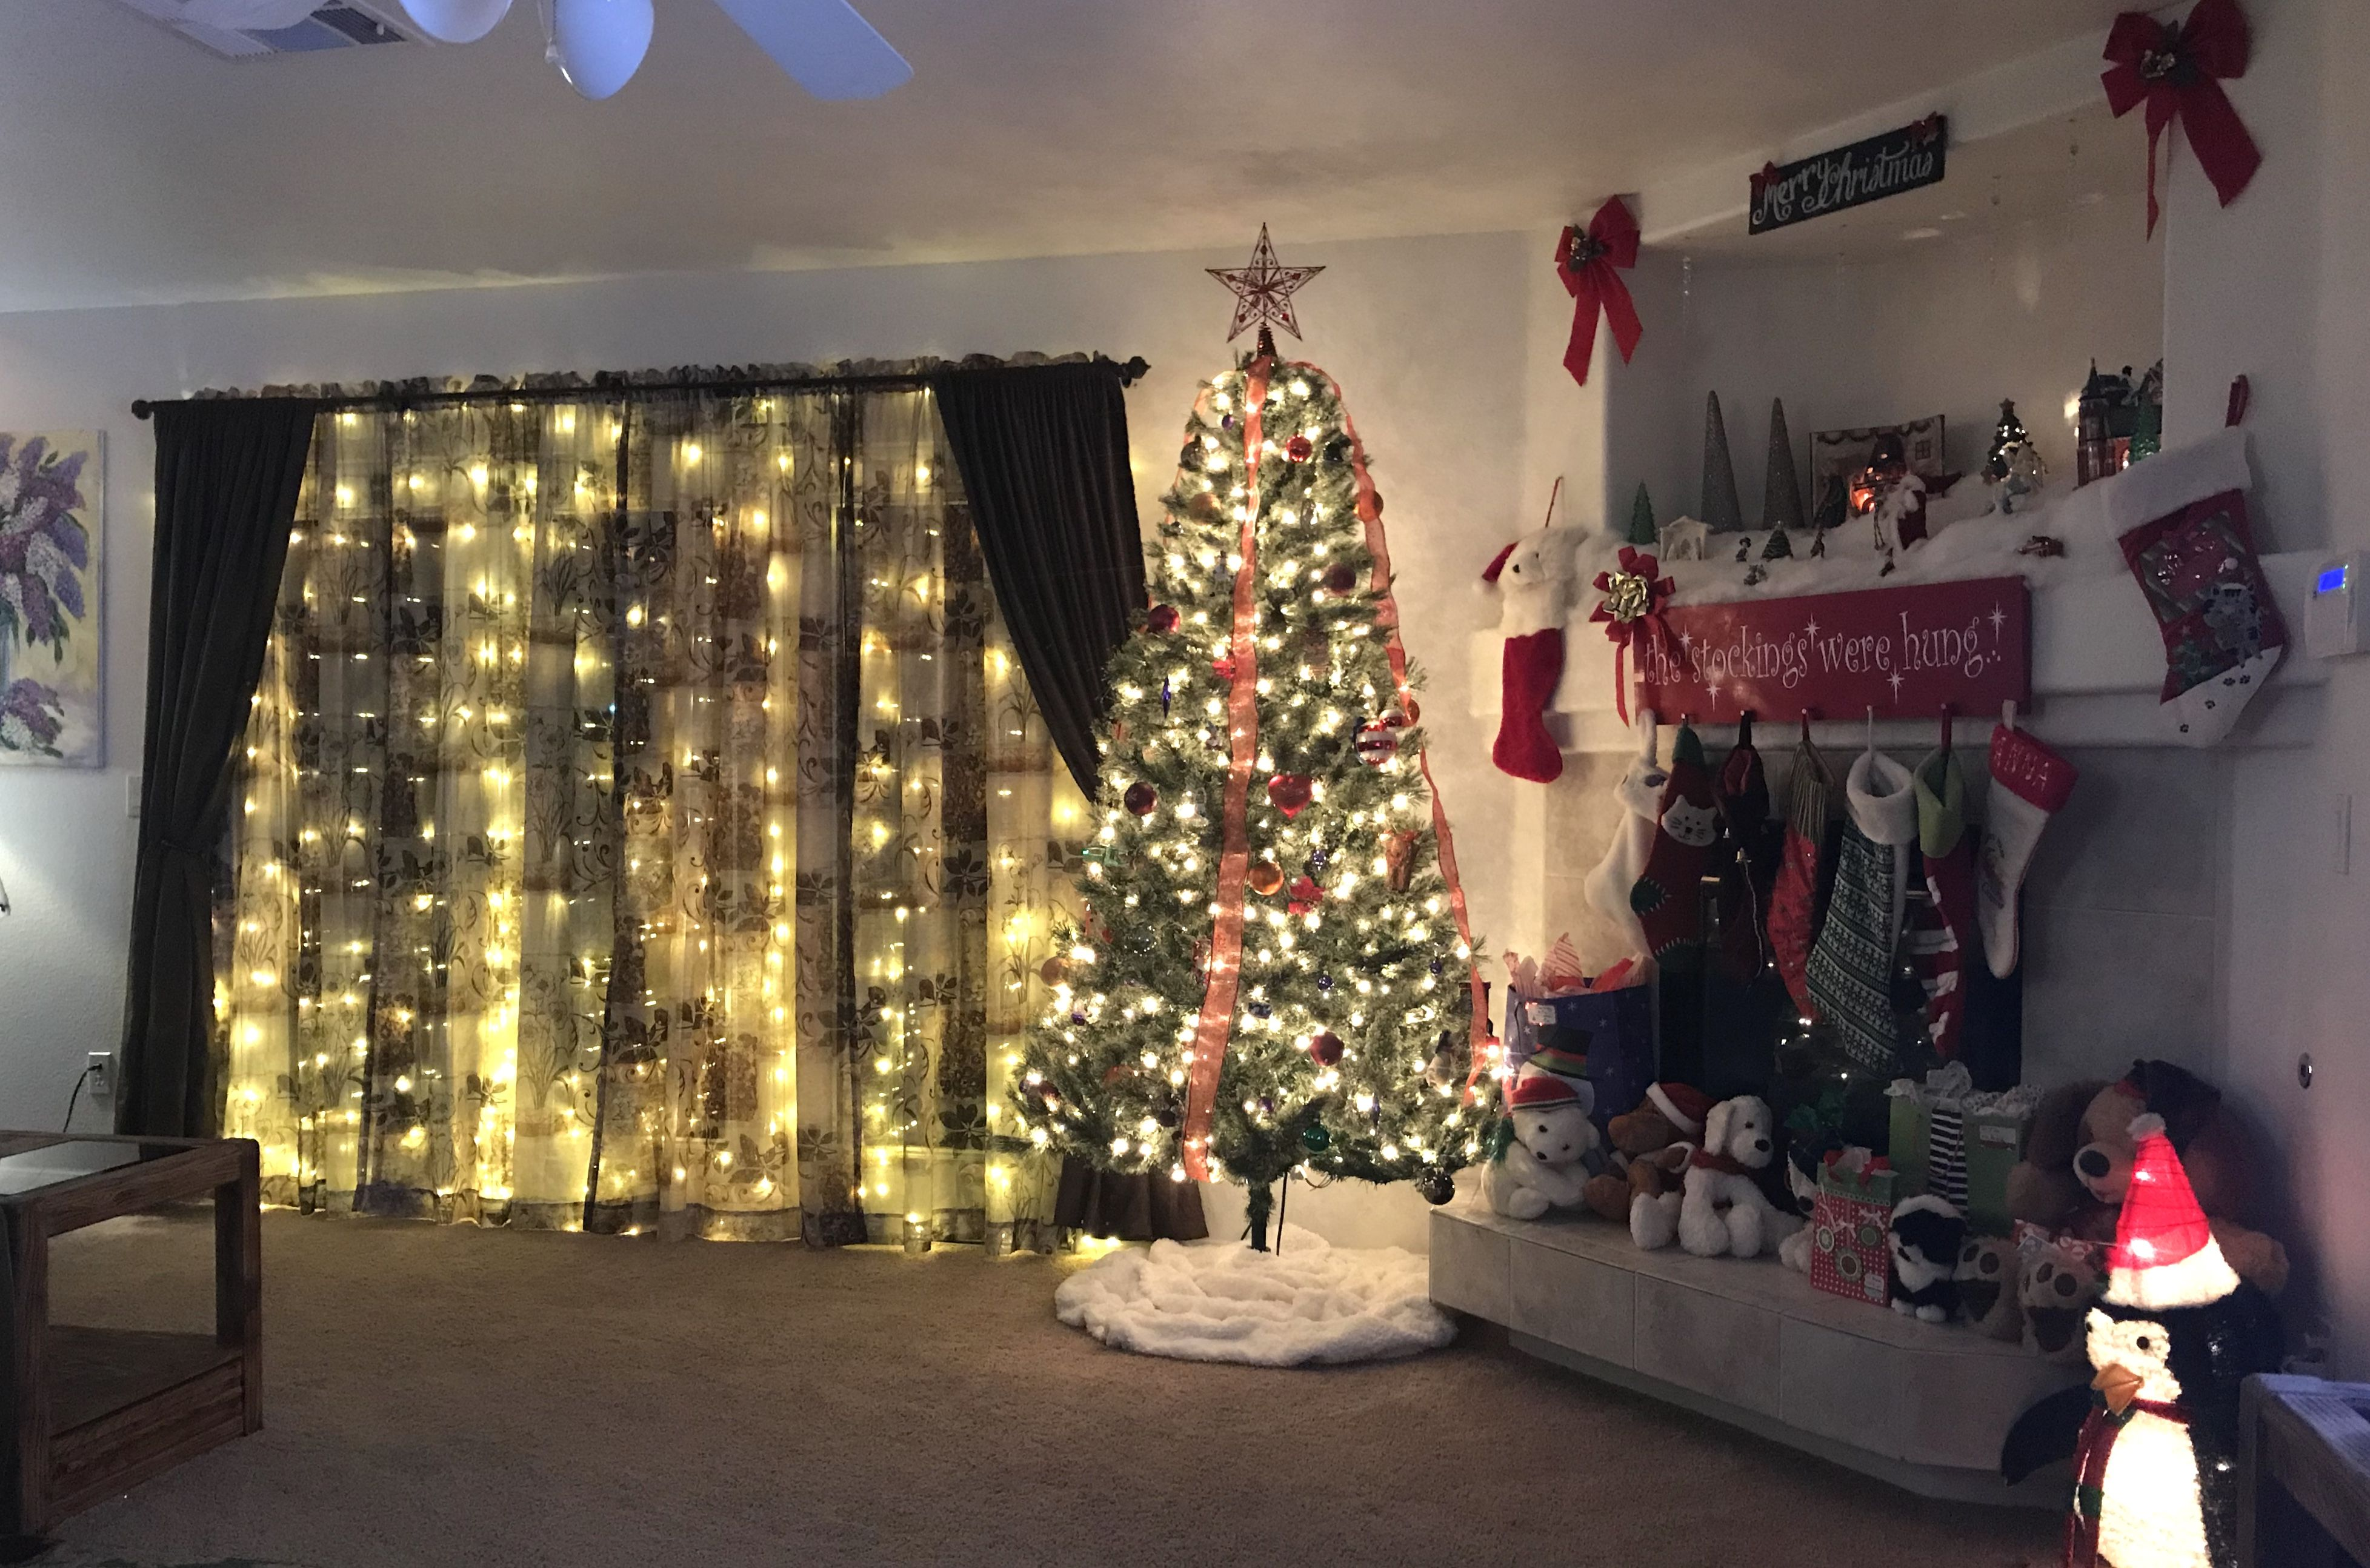 Living Room Christmas Decor Ideas Light Curtains Fireplace Mantel Christmas Tree Curtain Lights Christmas